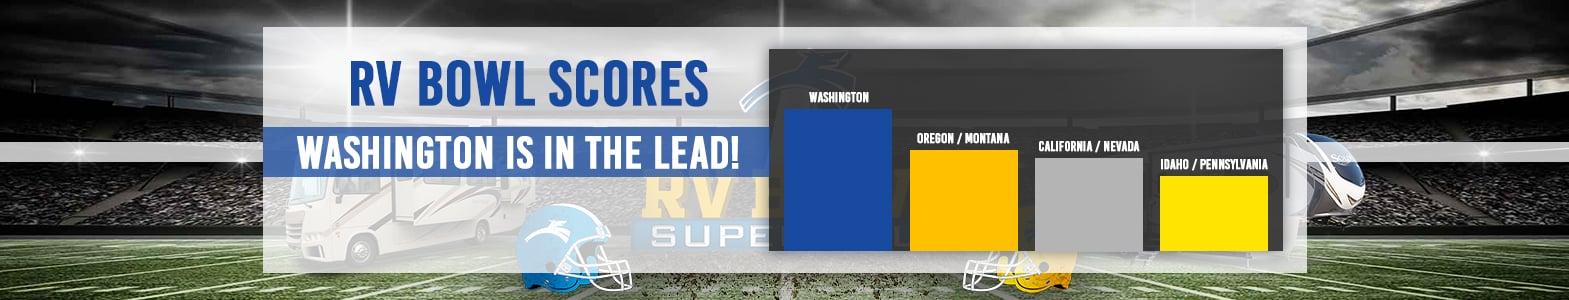 RV Bowl 2020 Scores